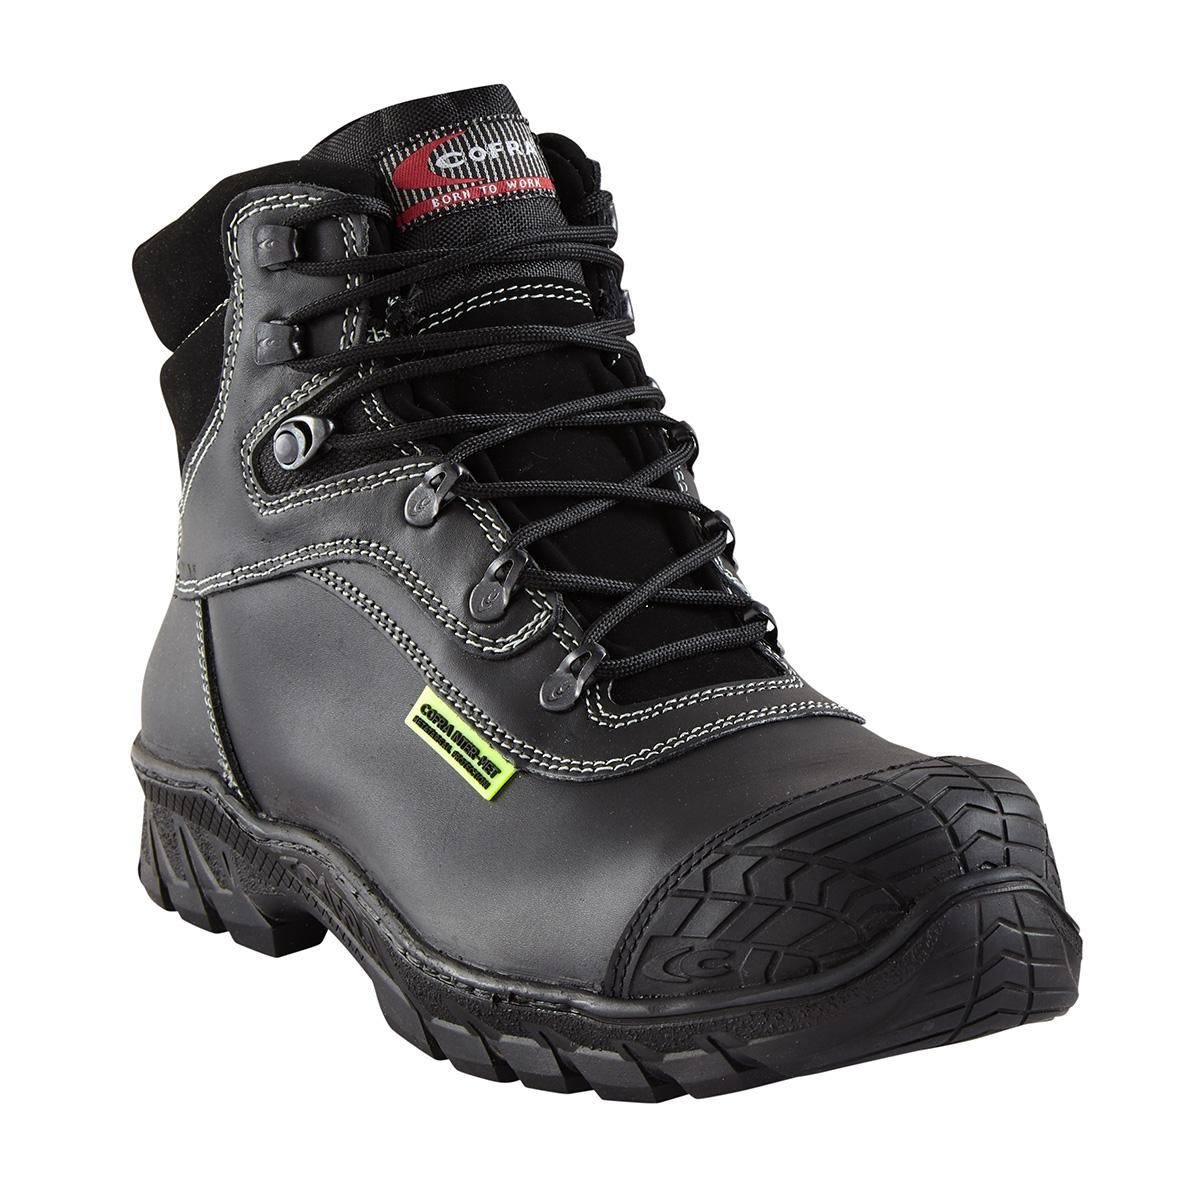 Darwen Internal metatarsal Black Safety Boots